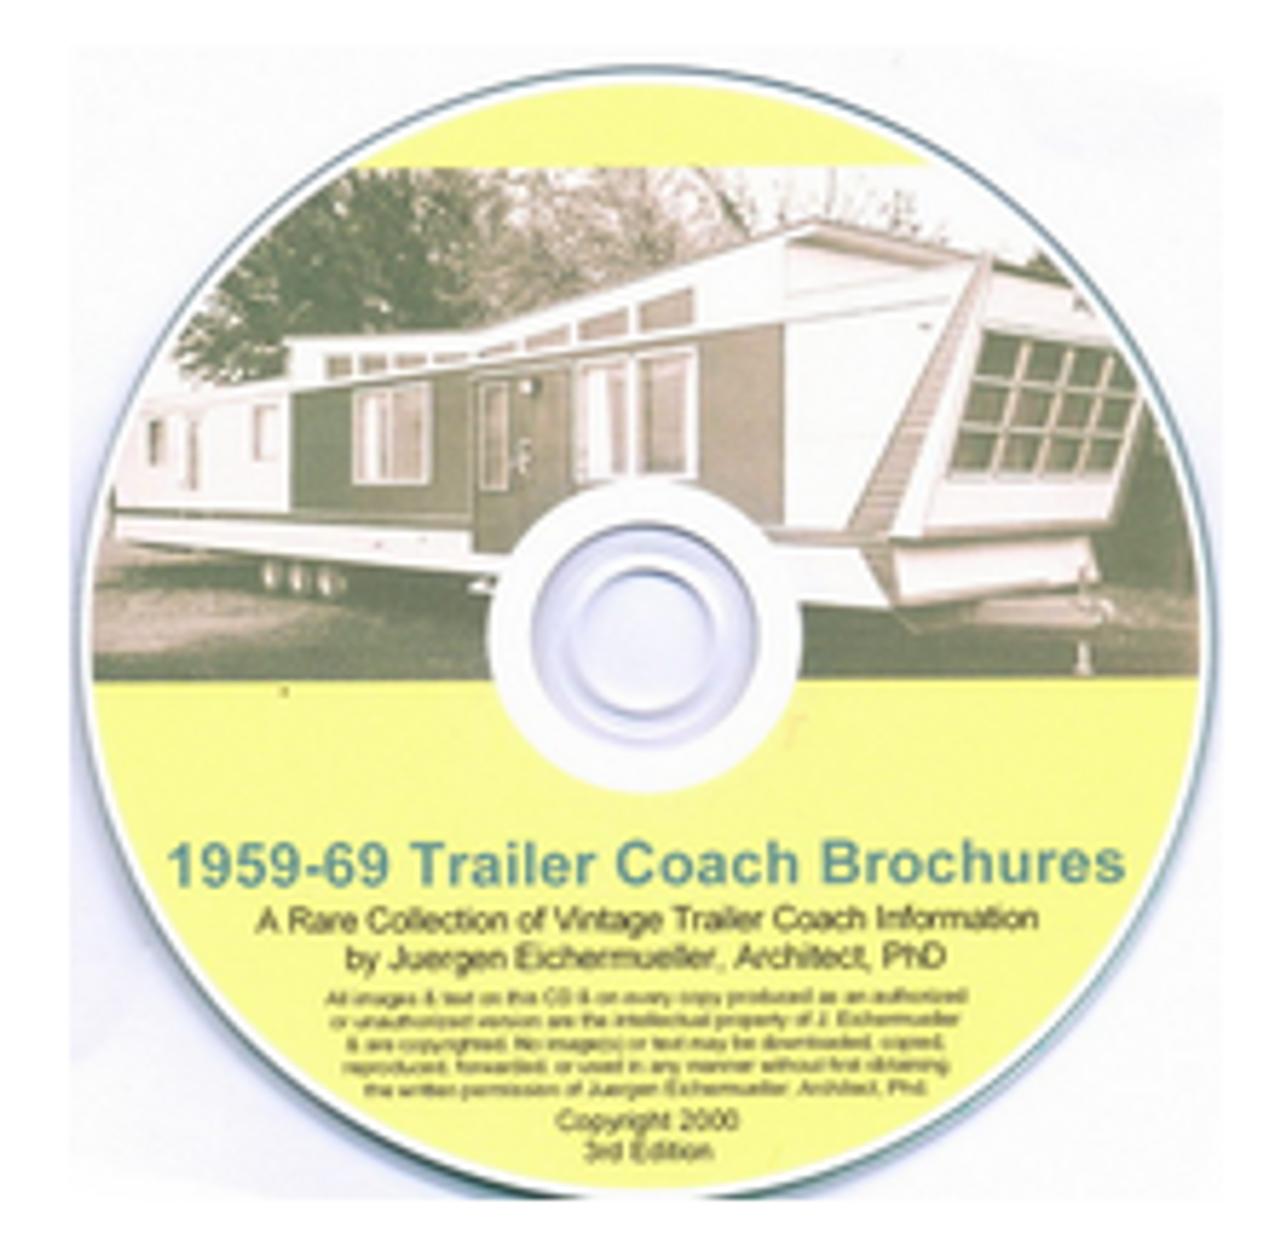 CD-ROM 1959-1969 Trailer Coach Brochures (CBL012)